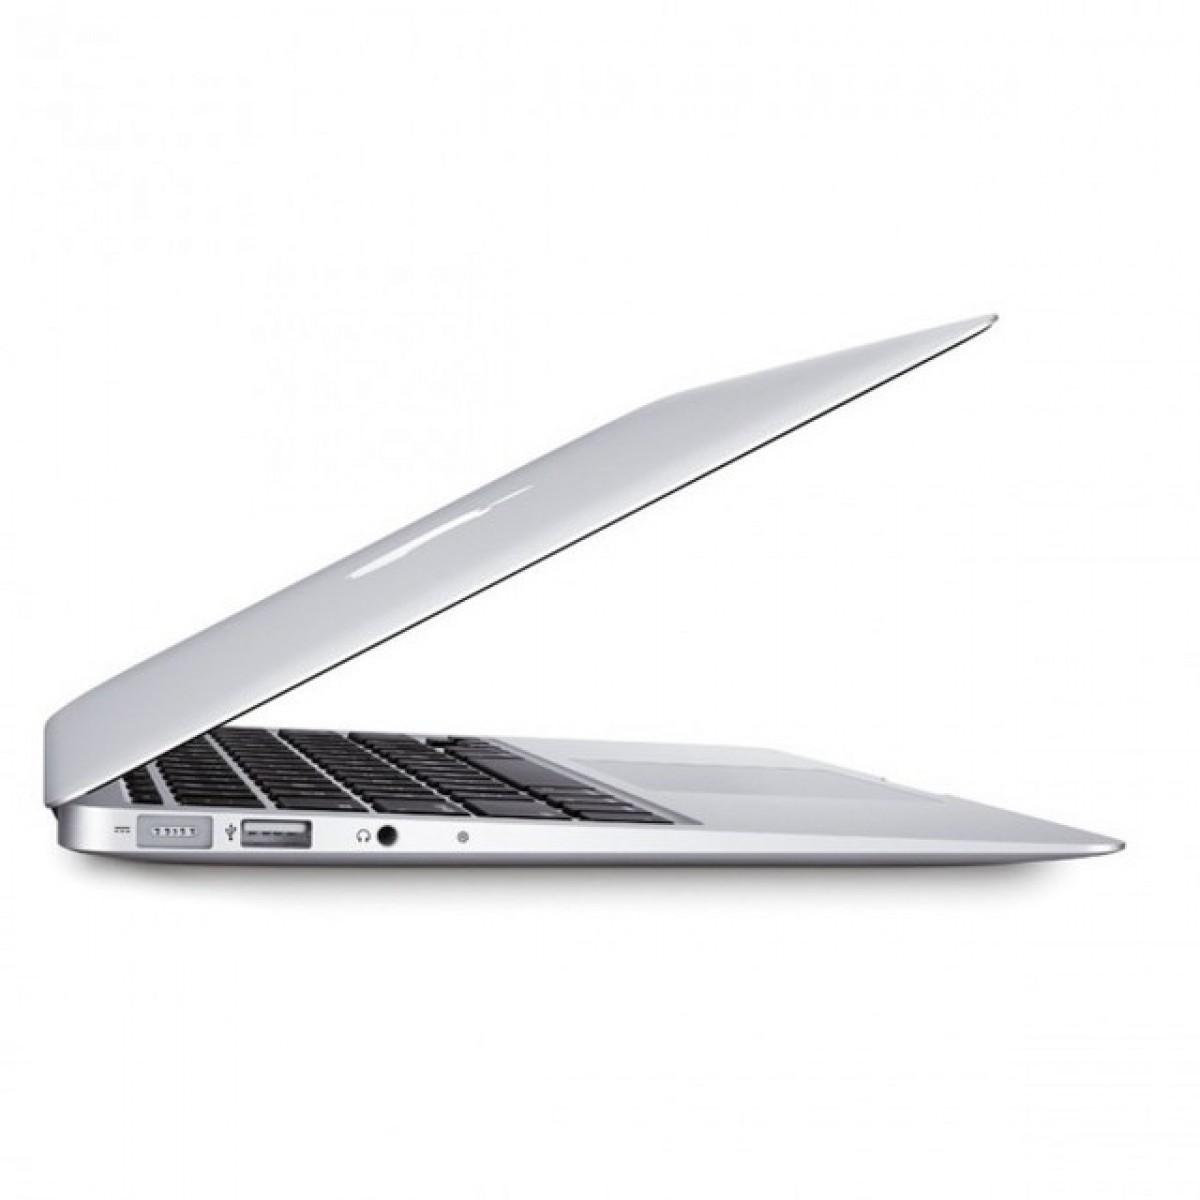 Macbook Air 2013 11.6 Inch - MD711- Core I5 4GB 128GB SSD New 99%